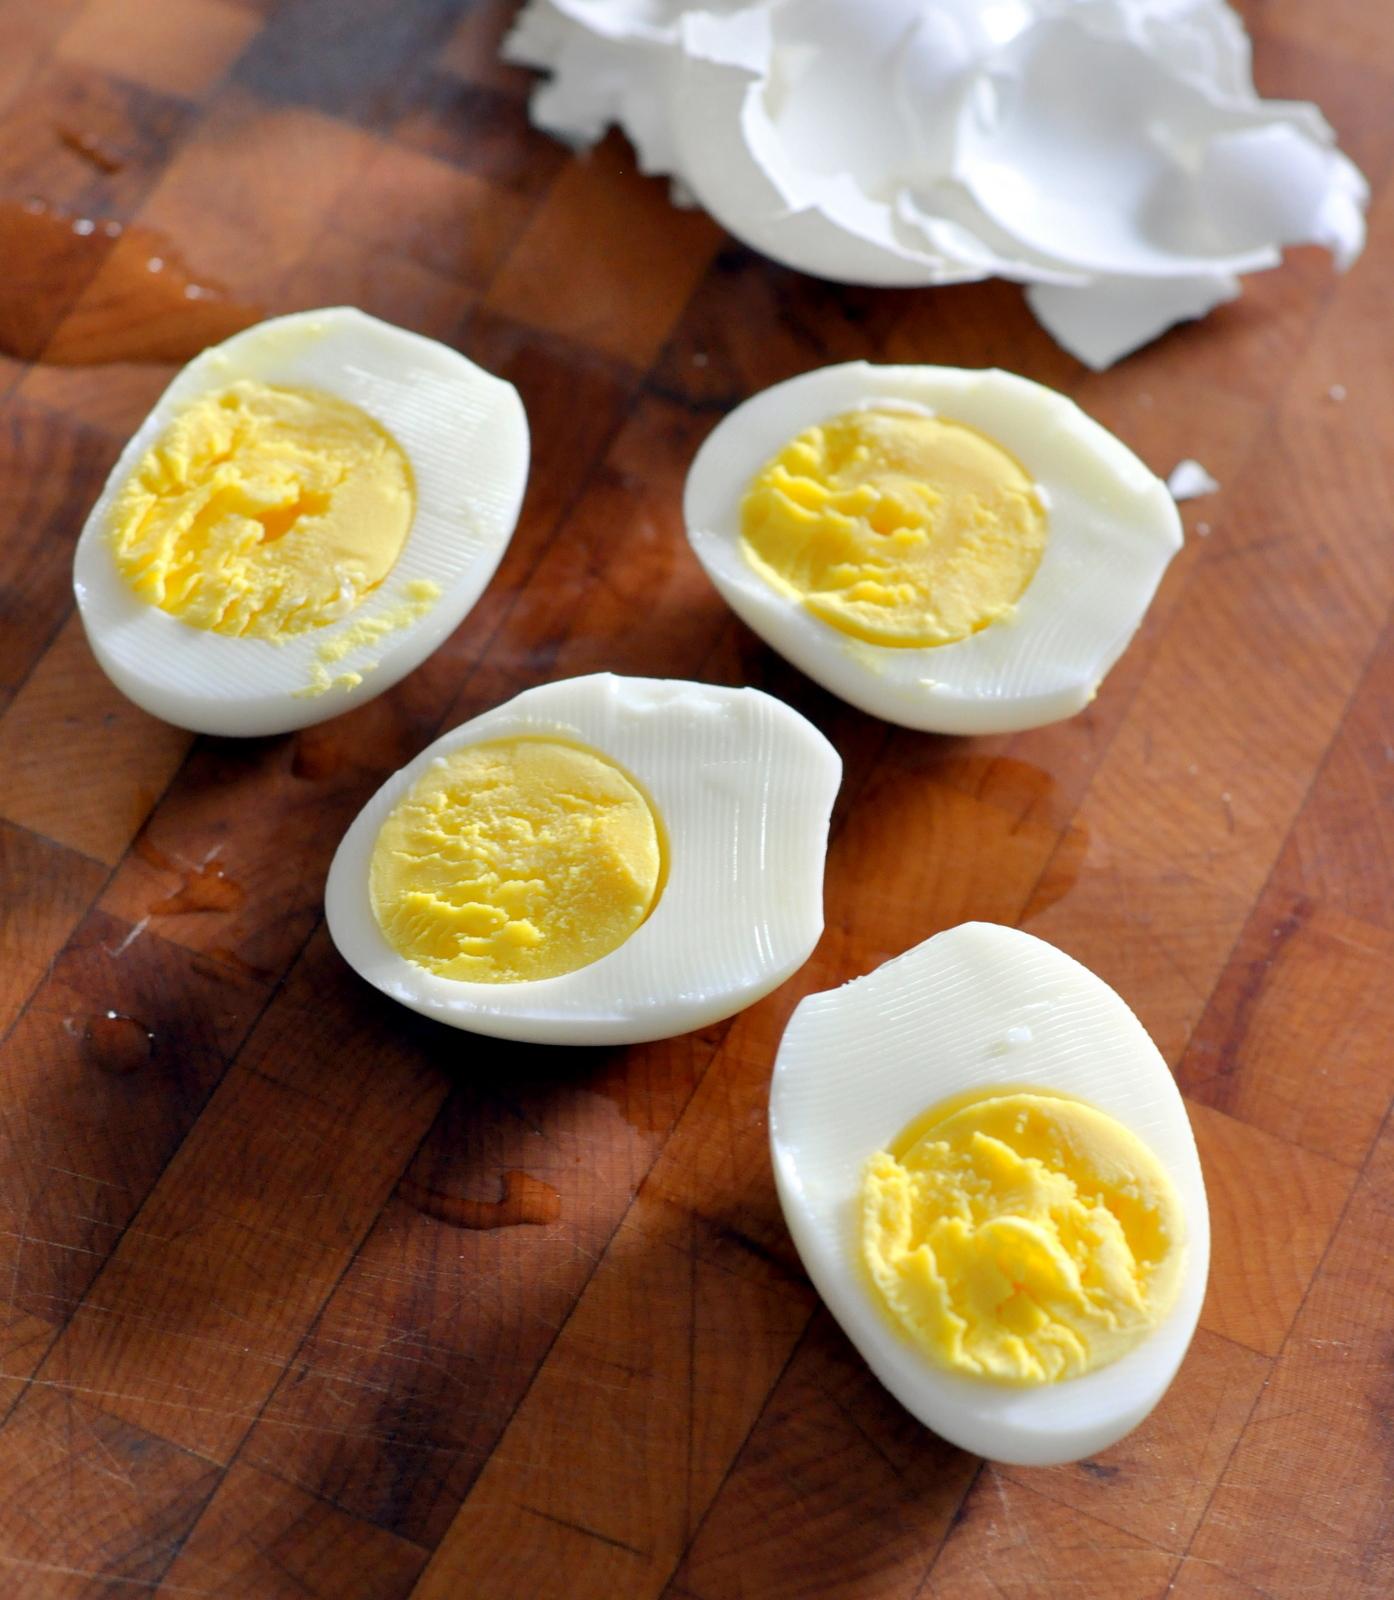 How To: Boil Eggs | Six Secrets on Taste As You Go